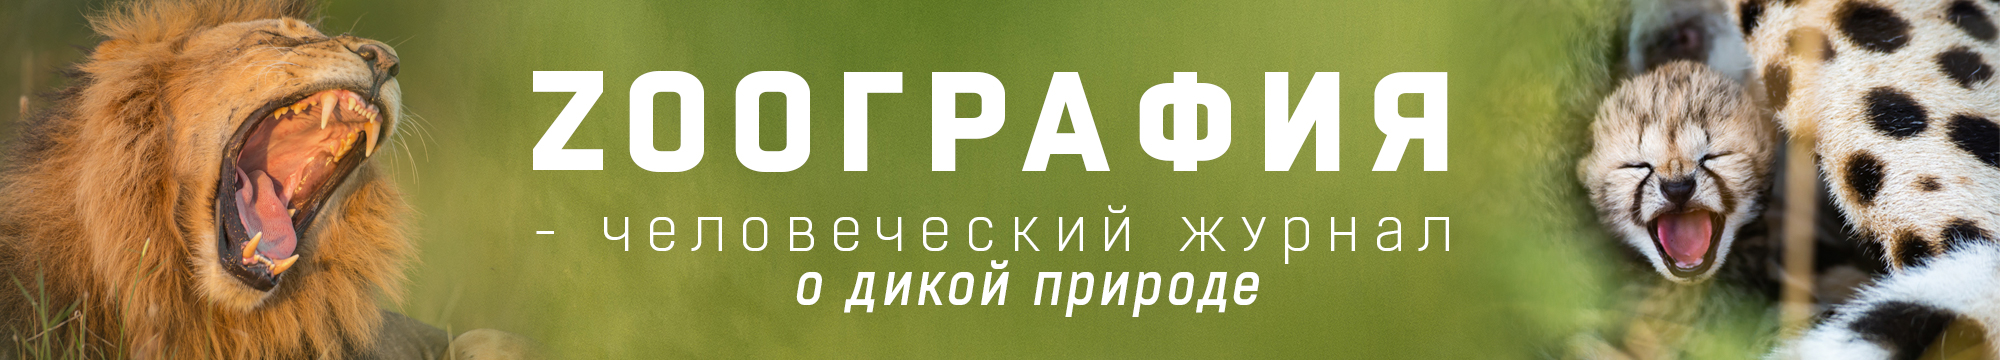 Переехал в Санкт-Петербург...